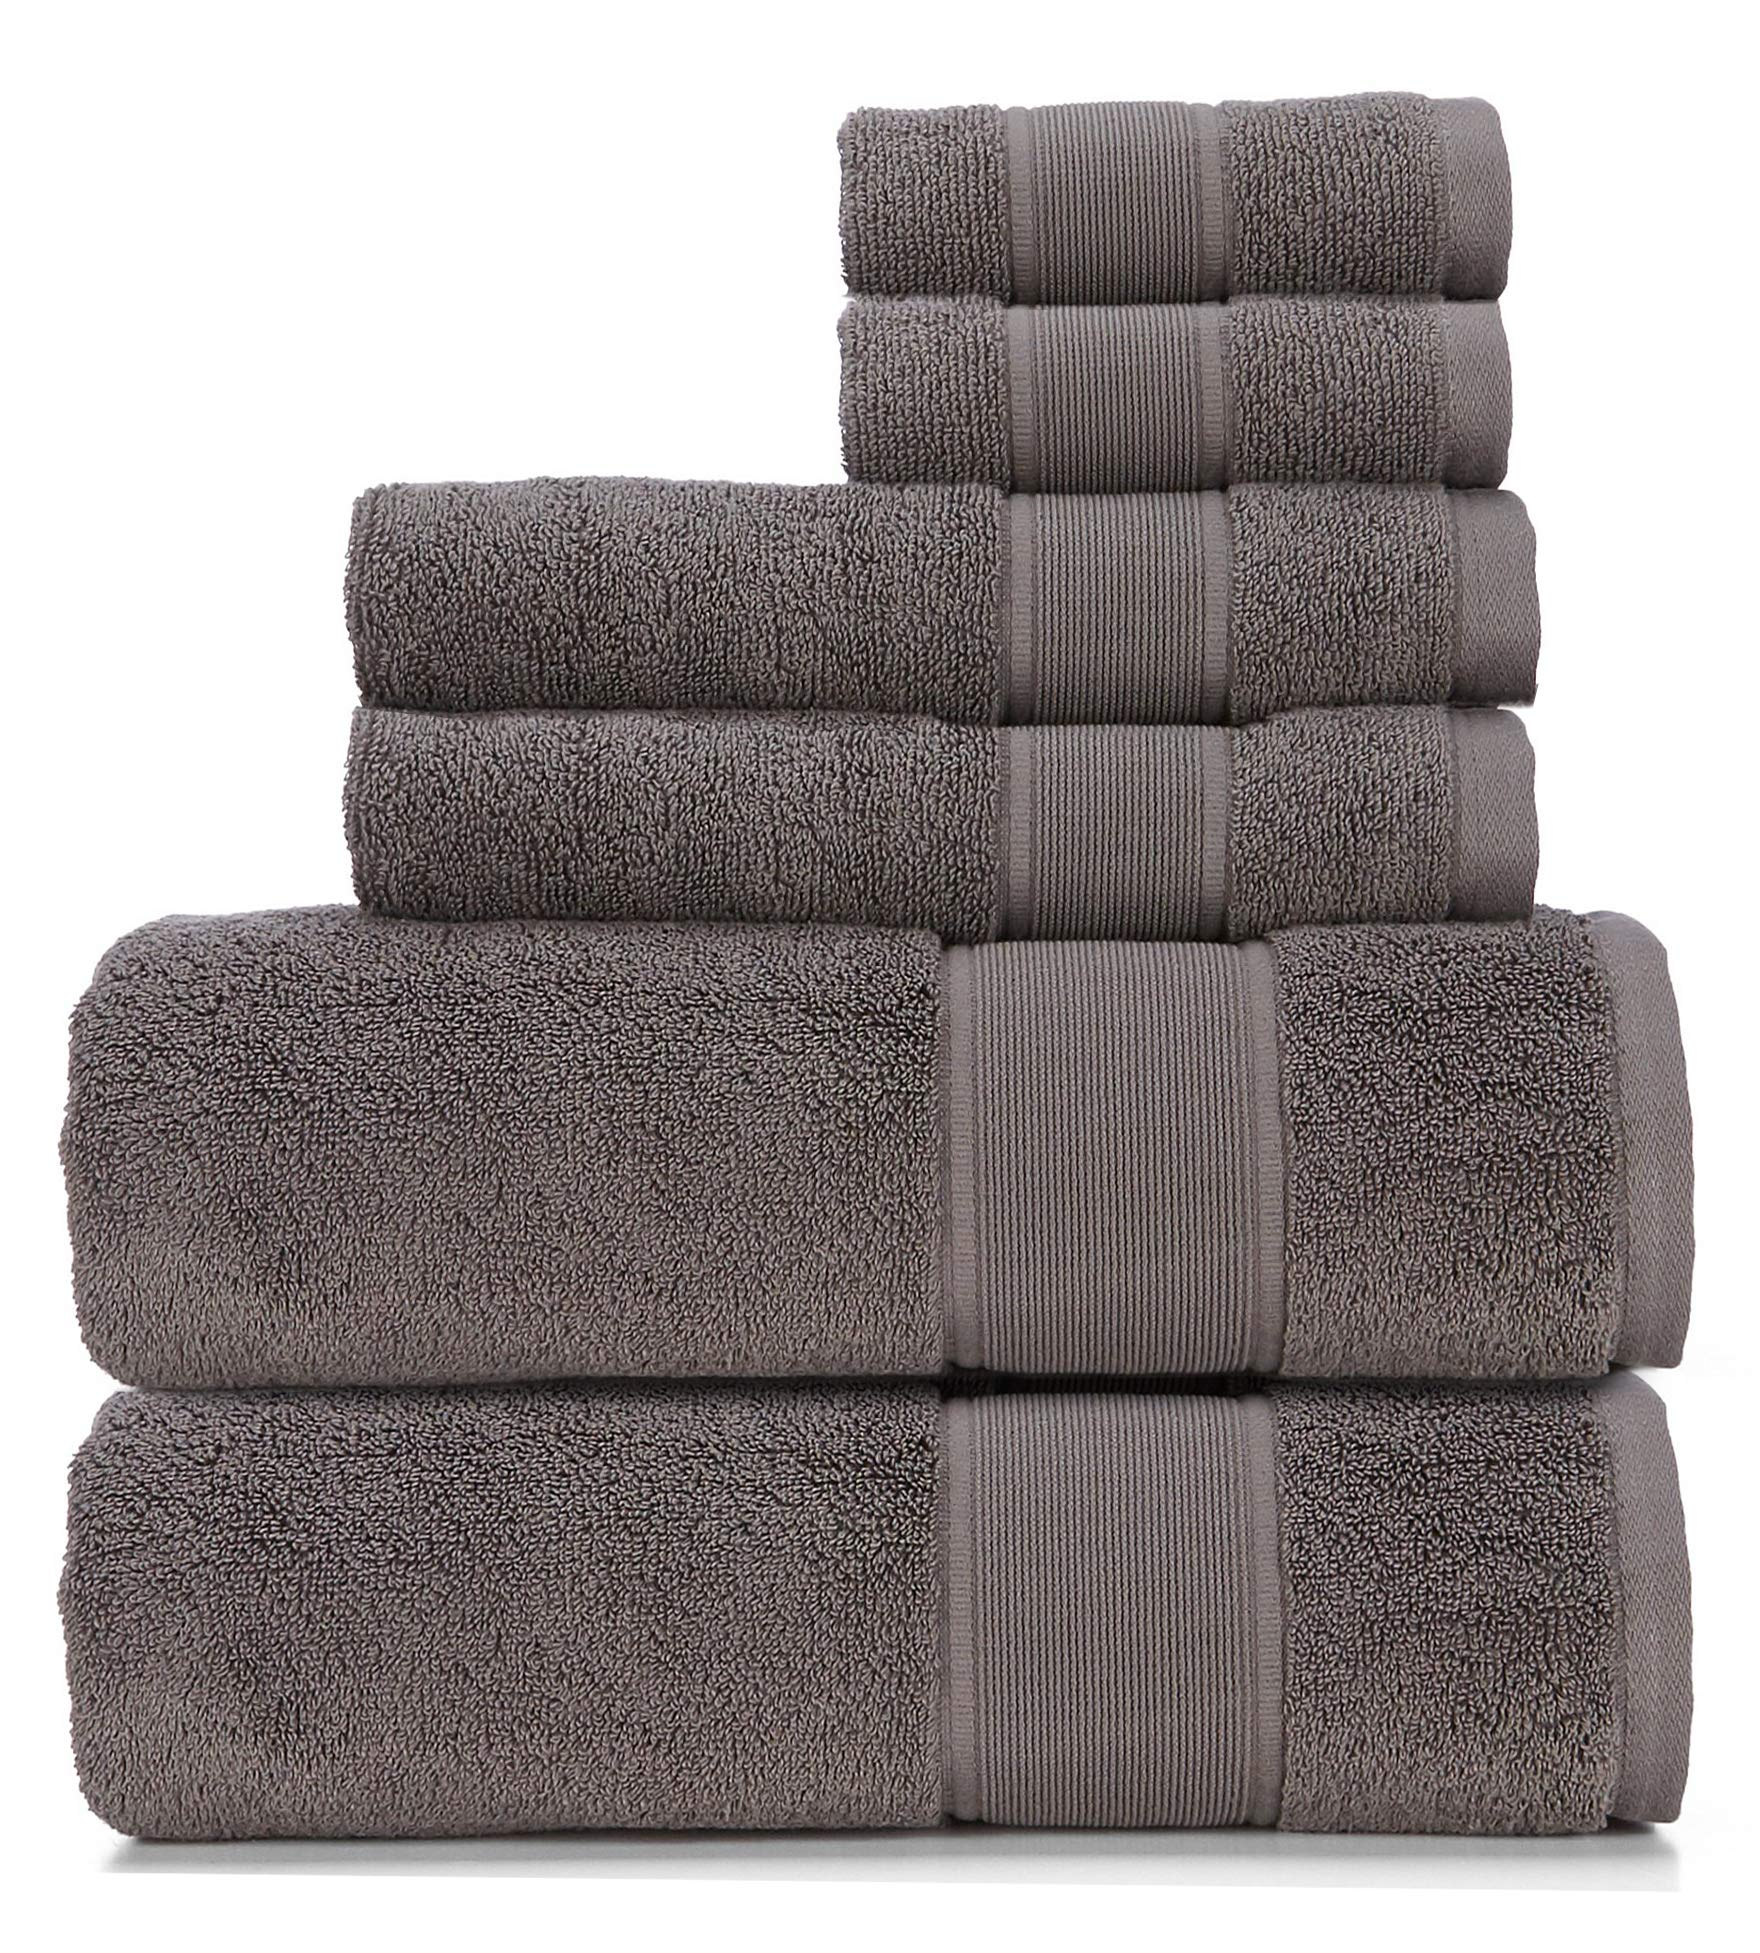 Ralph Lauren Sanders Towel 6 Piece Set True Charcoal - 2 Bath Towels, 2 Hand Towels, 2 Washcloths